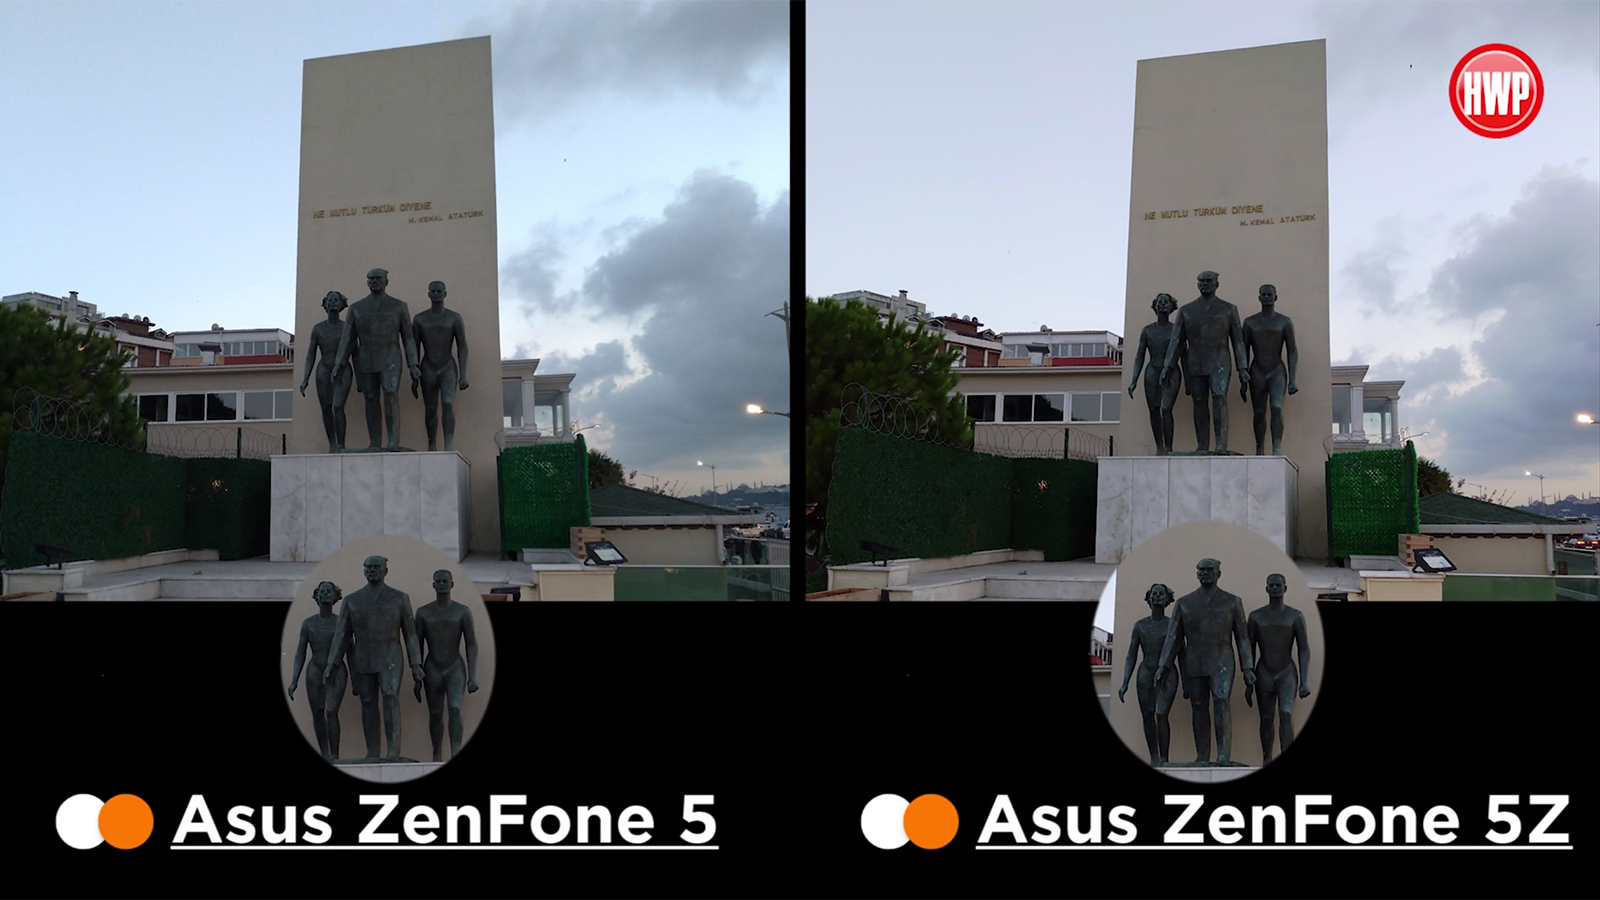 Asus ZenFone 5 vs Asus ZenFone 5Z kamera karşılaştırması